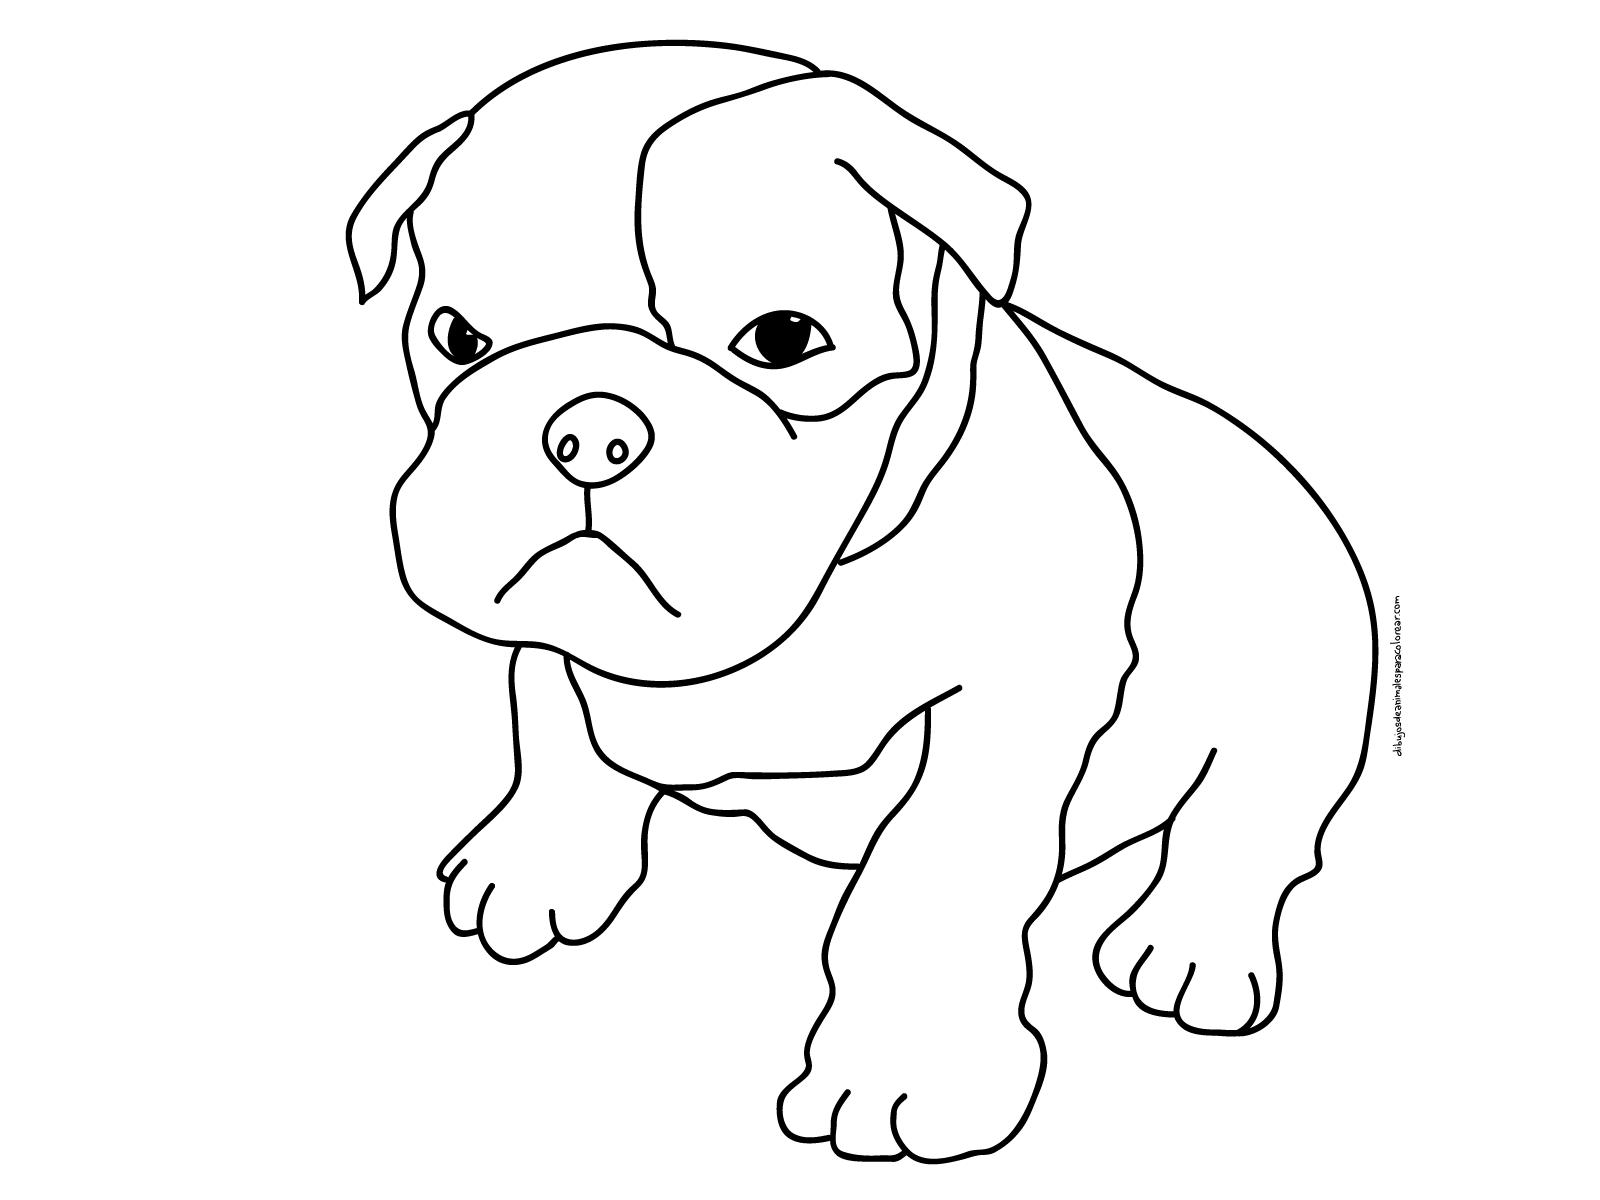 Dibujos De Perros. Latest Dibujo De Un Perro De Perfil. Cheap ...